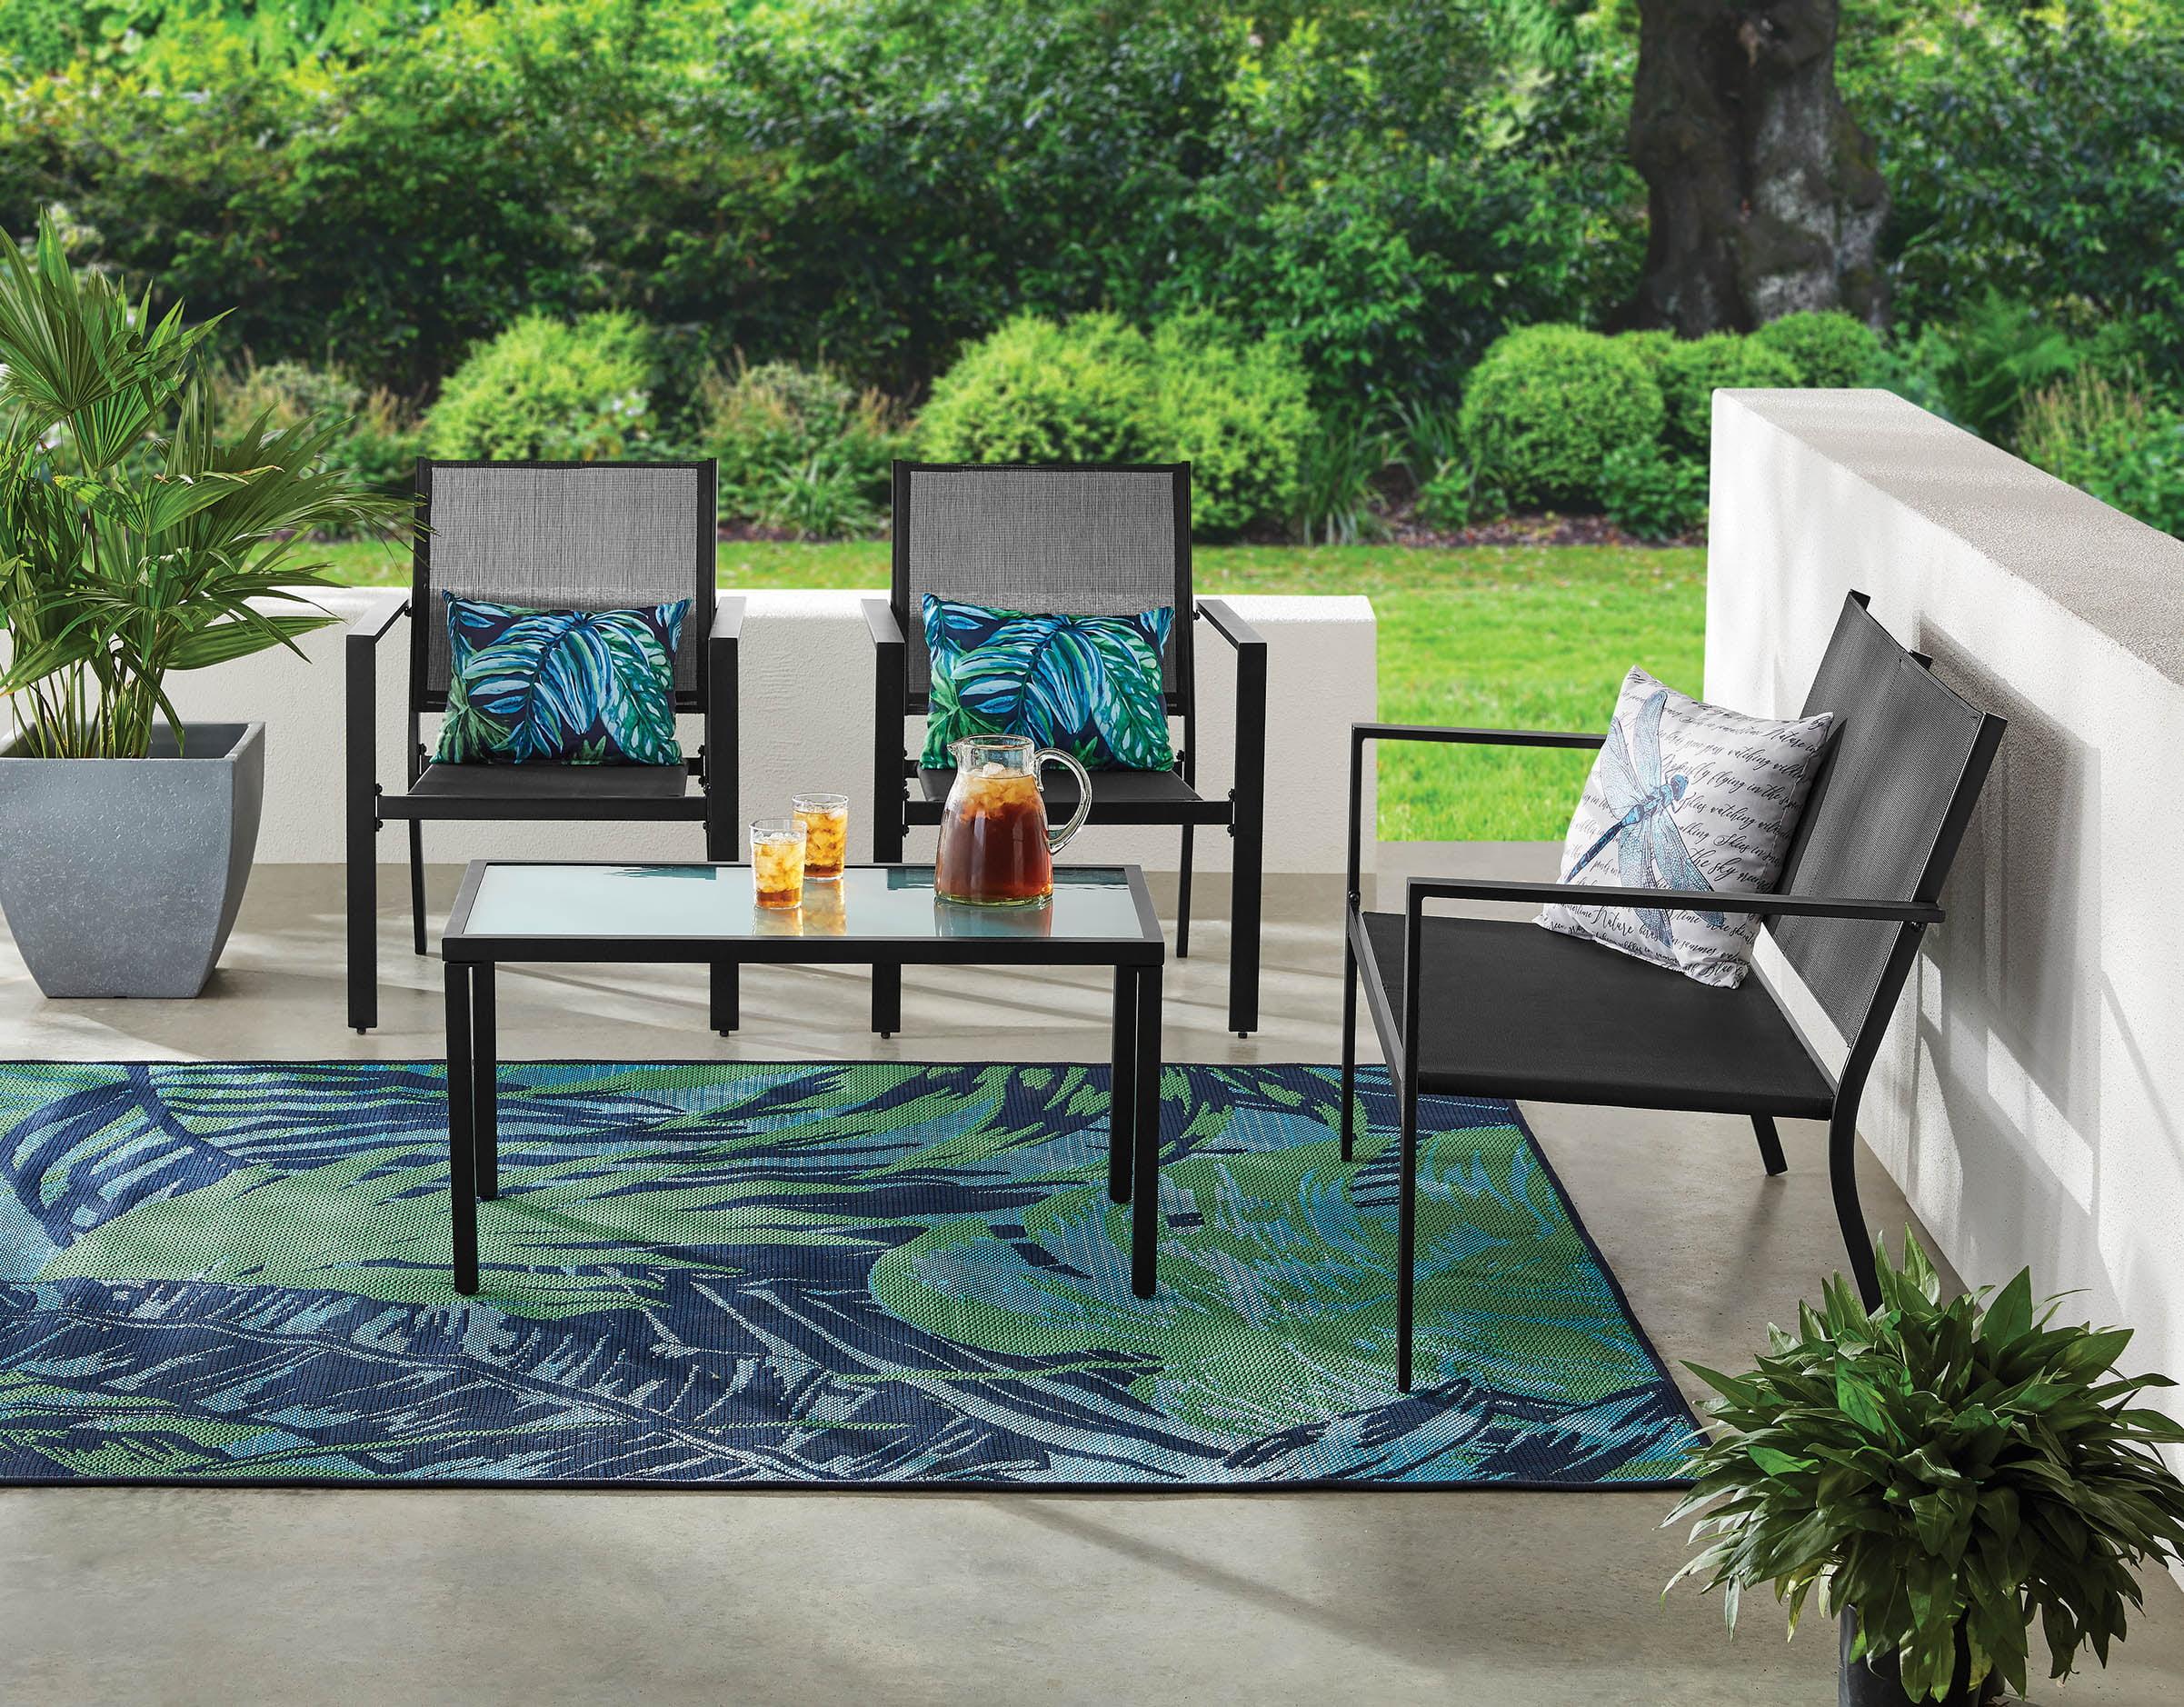 mainstays kingston ridge 4 piece outdoor patio furniture with grey sling conversation set black metal